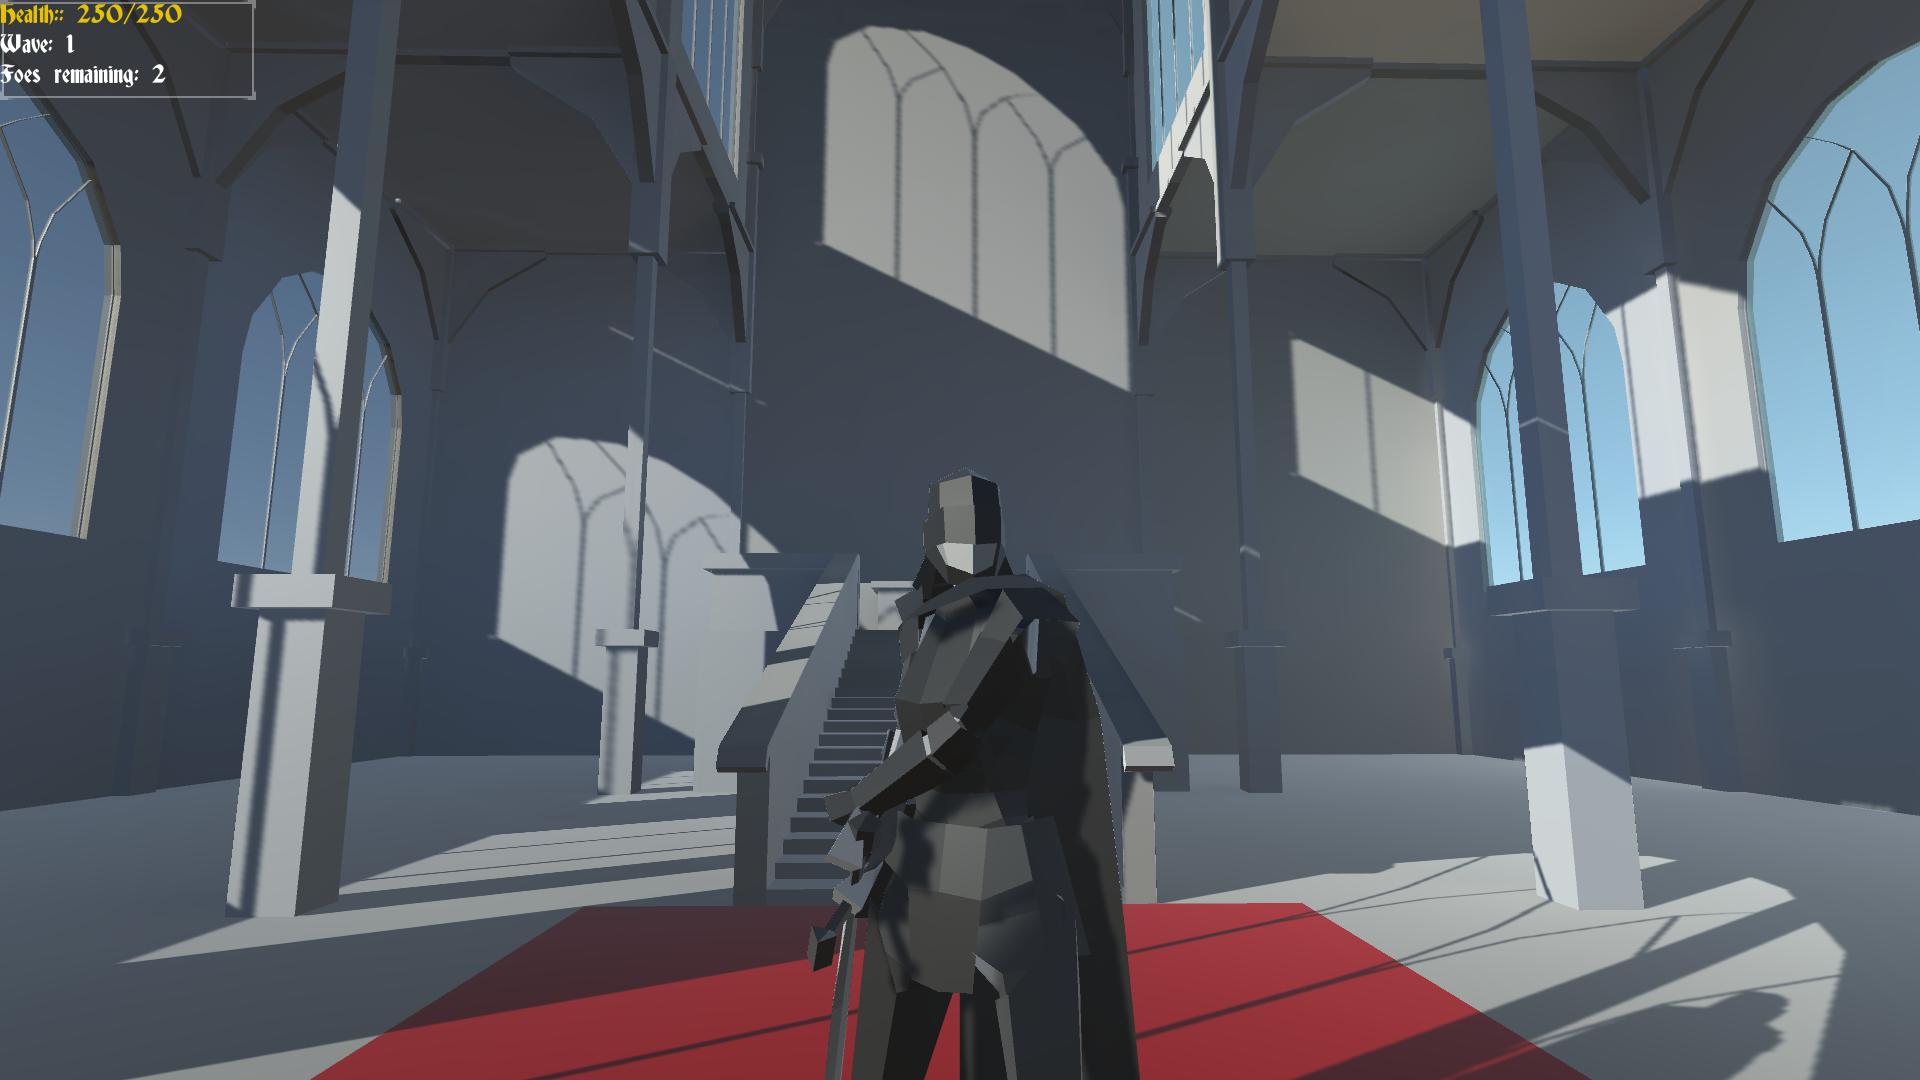 Ludum Dare #37 - Guardian